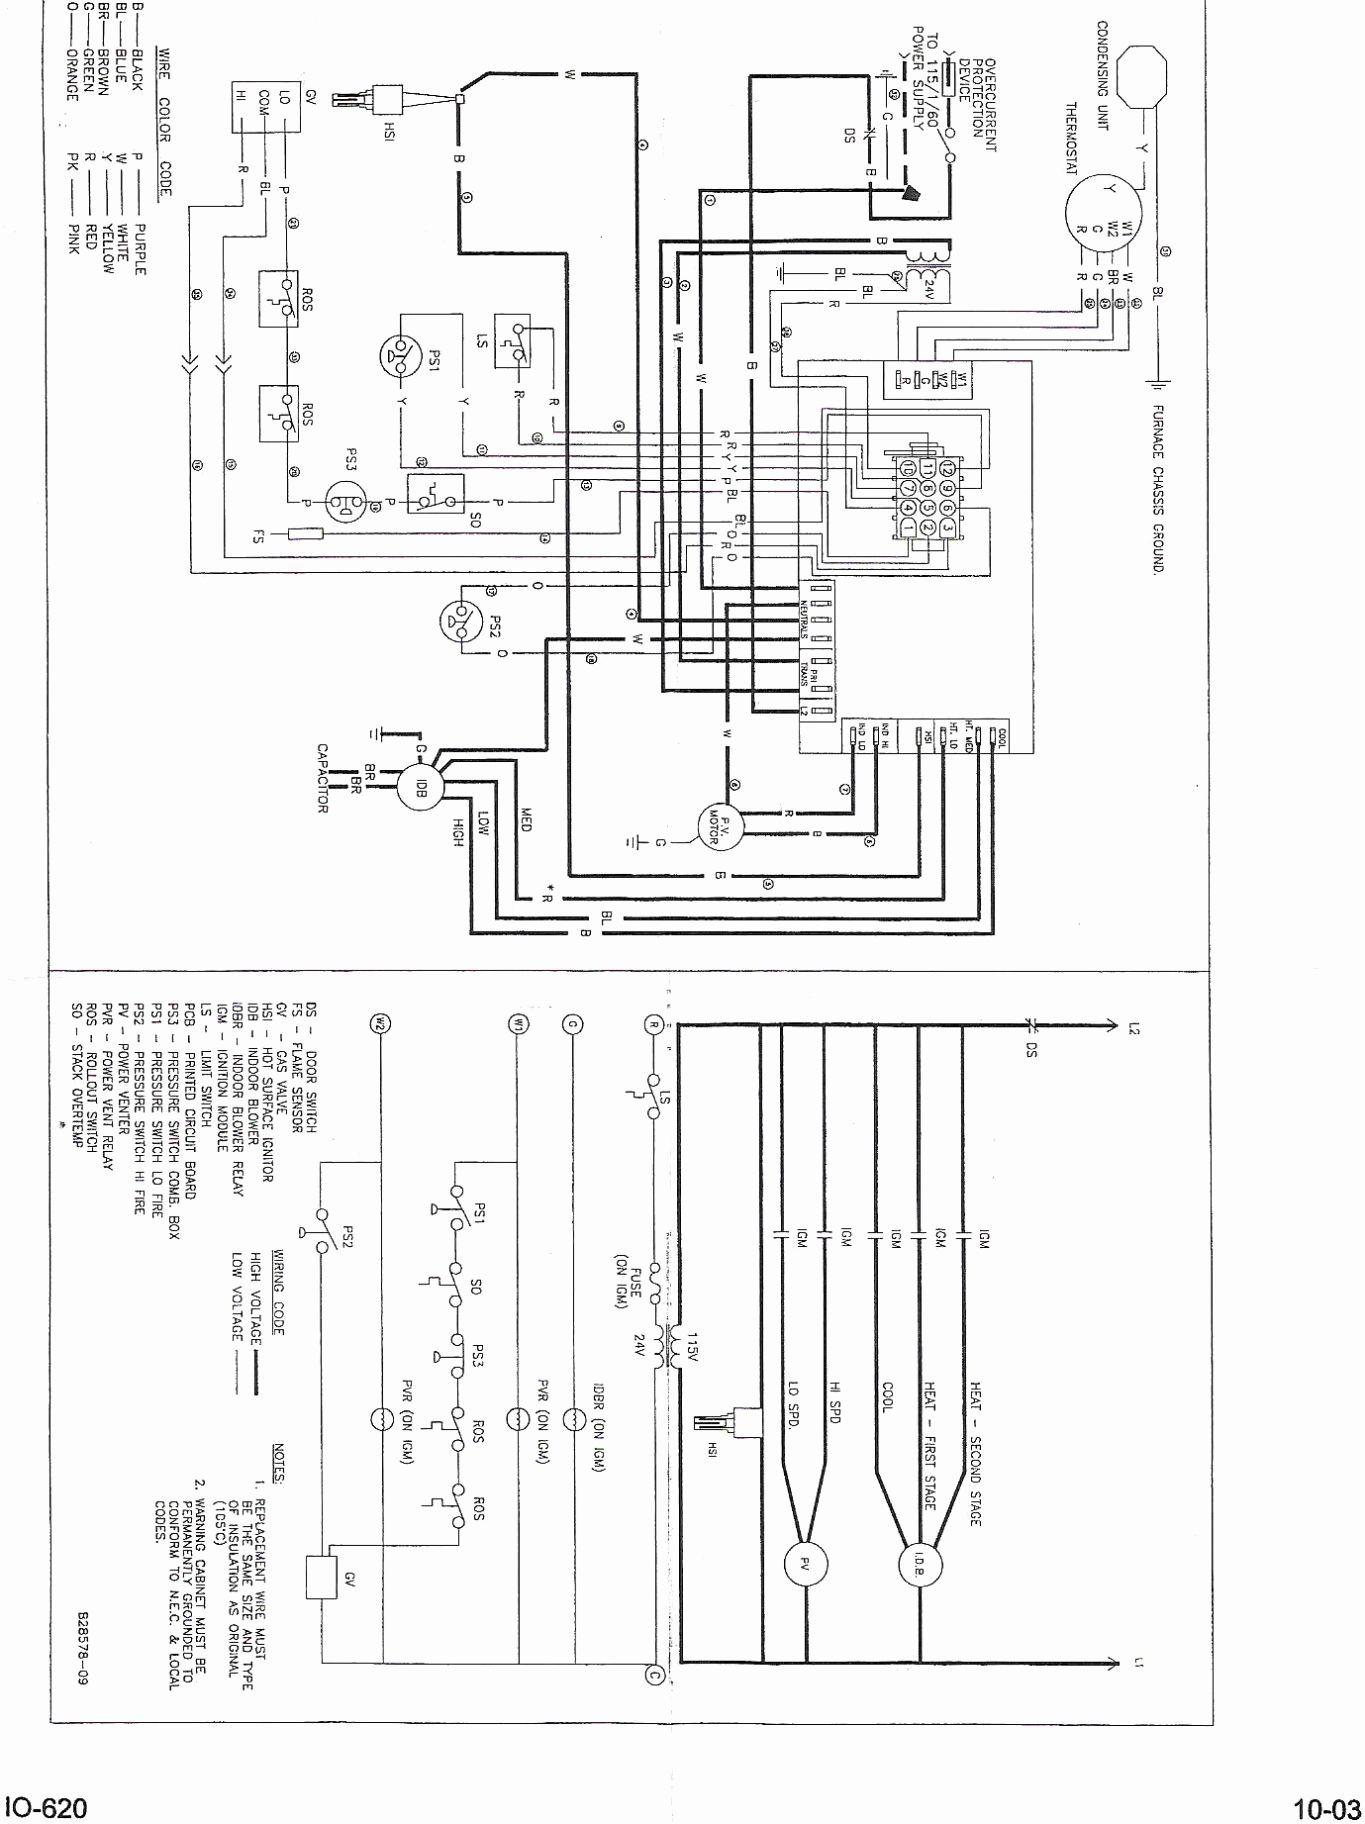 Strange Goodman Furnace Wiring Diagram Wirings Diagram Wiring Digital Resources Cettecompassionincorg